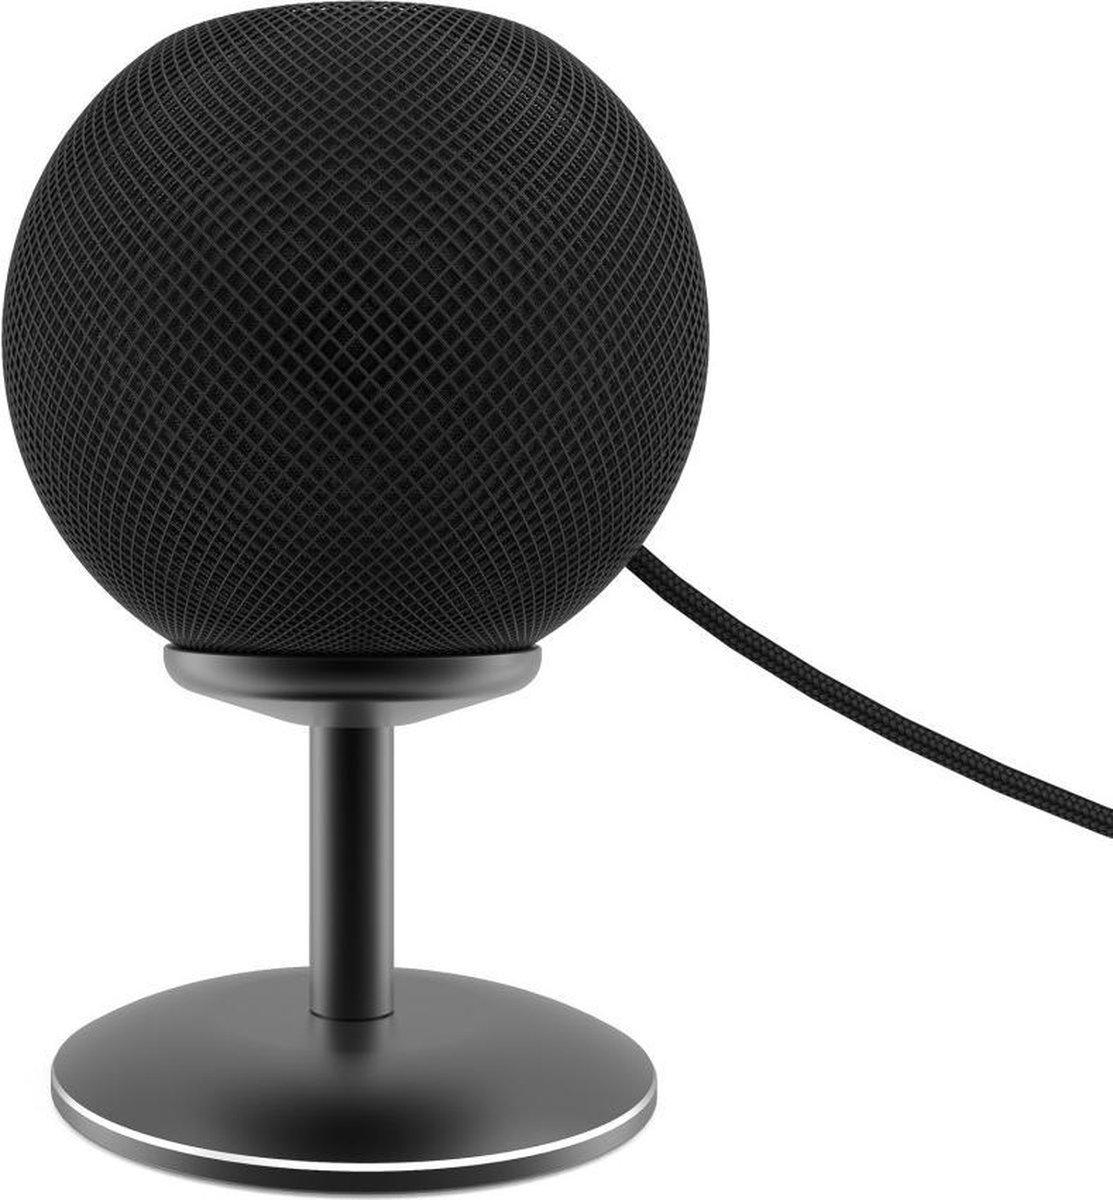 Luxe Aluminium Dock Charger Standaard Houder Voor Apple Homepod Mini Smart Speaker - Docking Station Oplaadstation Desk Mount - Tafel Stand Steun - Display Oplaad Stand - Laadstation - Tafel/Bureau/Nachtkastje- Antislip - Zwart